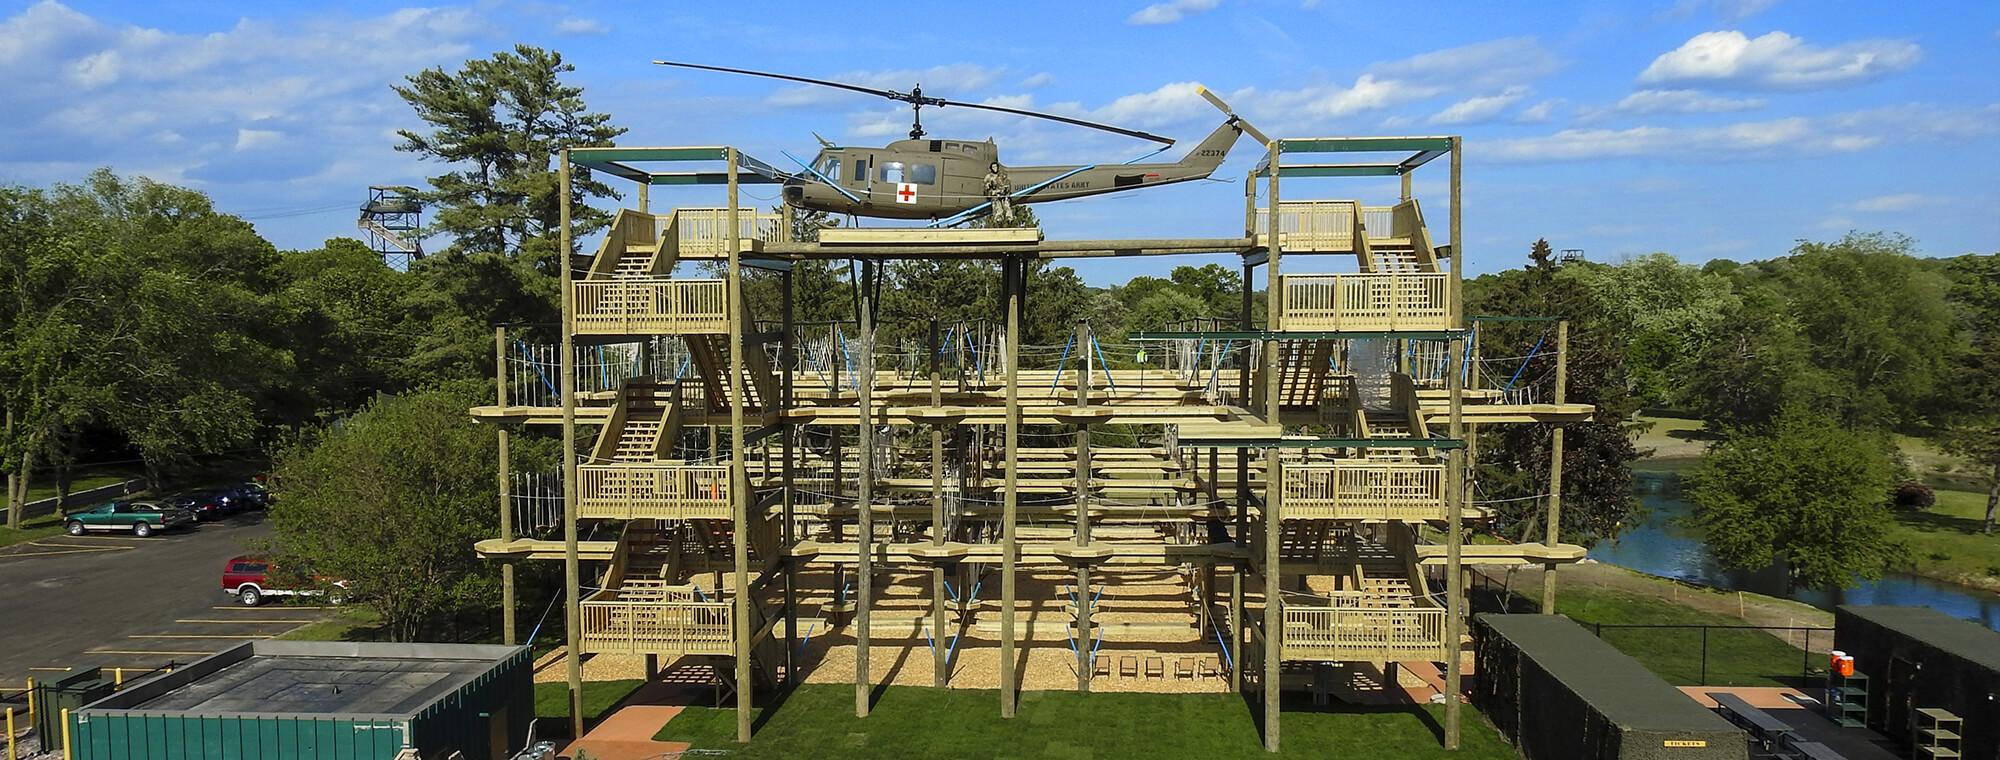 Bigfoot Ropes Course Dells Adventure Park